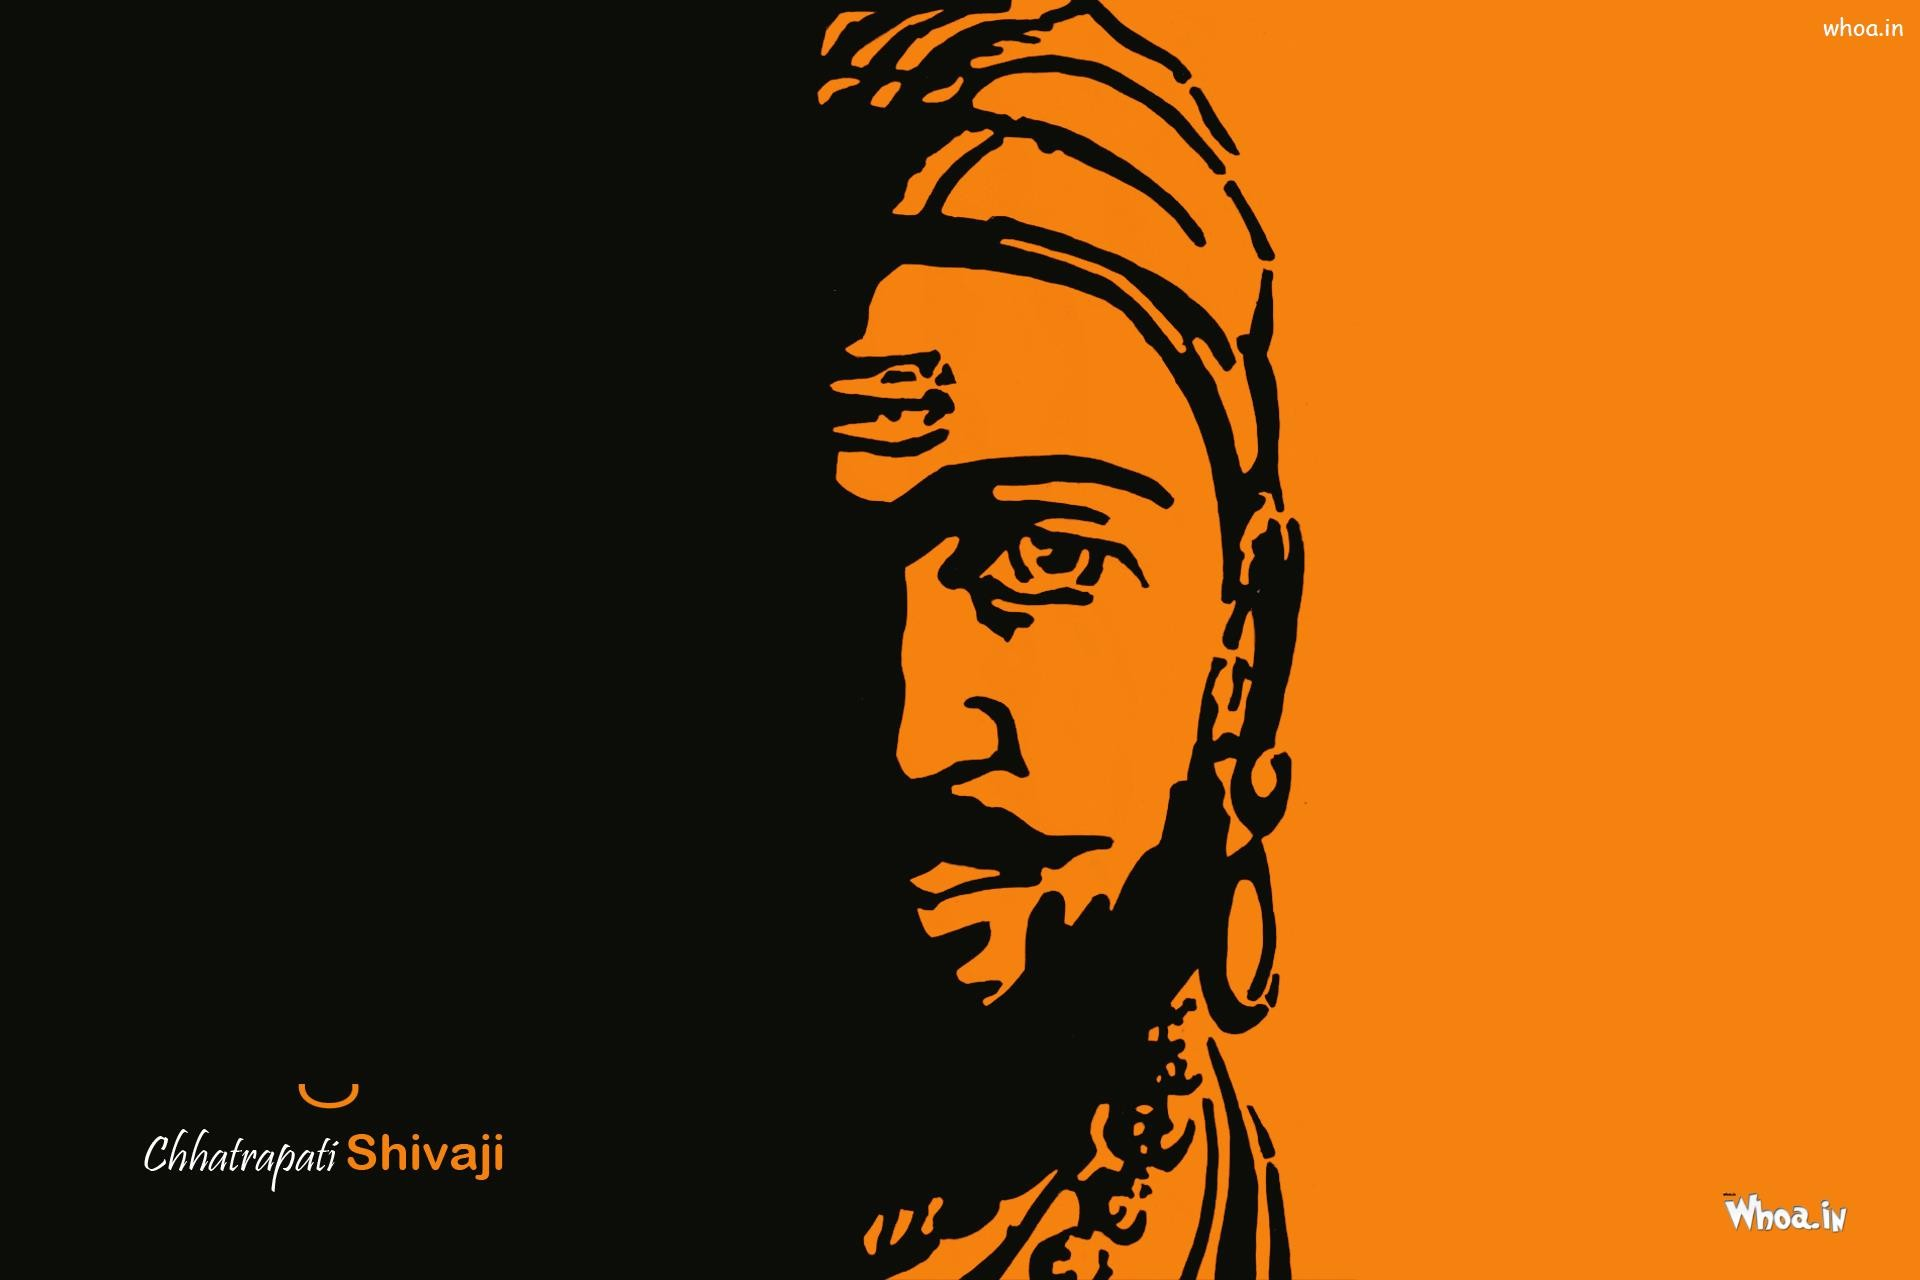 … Chatrapati Shivaji Maharaj Face Closeup HD Wallpaper